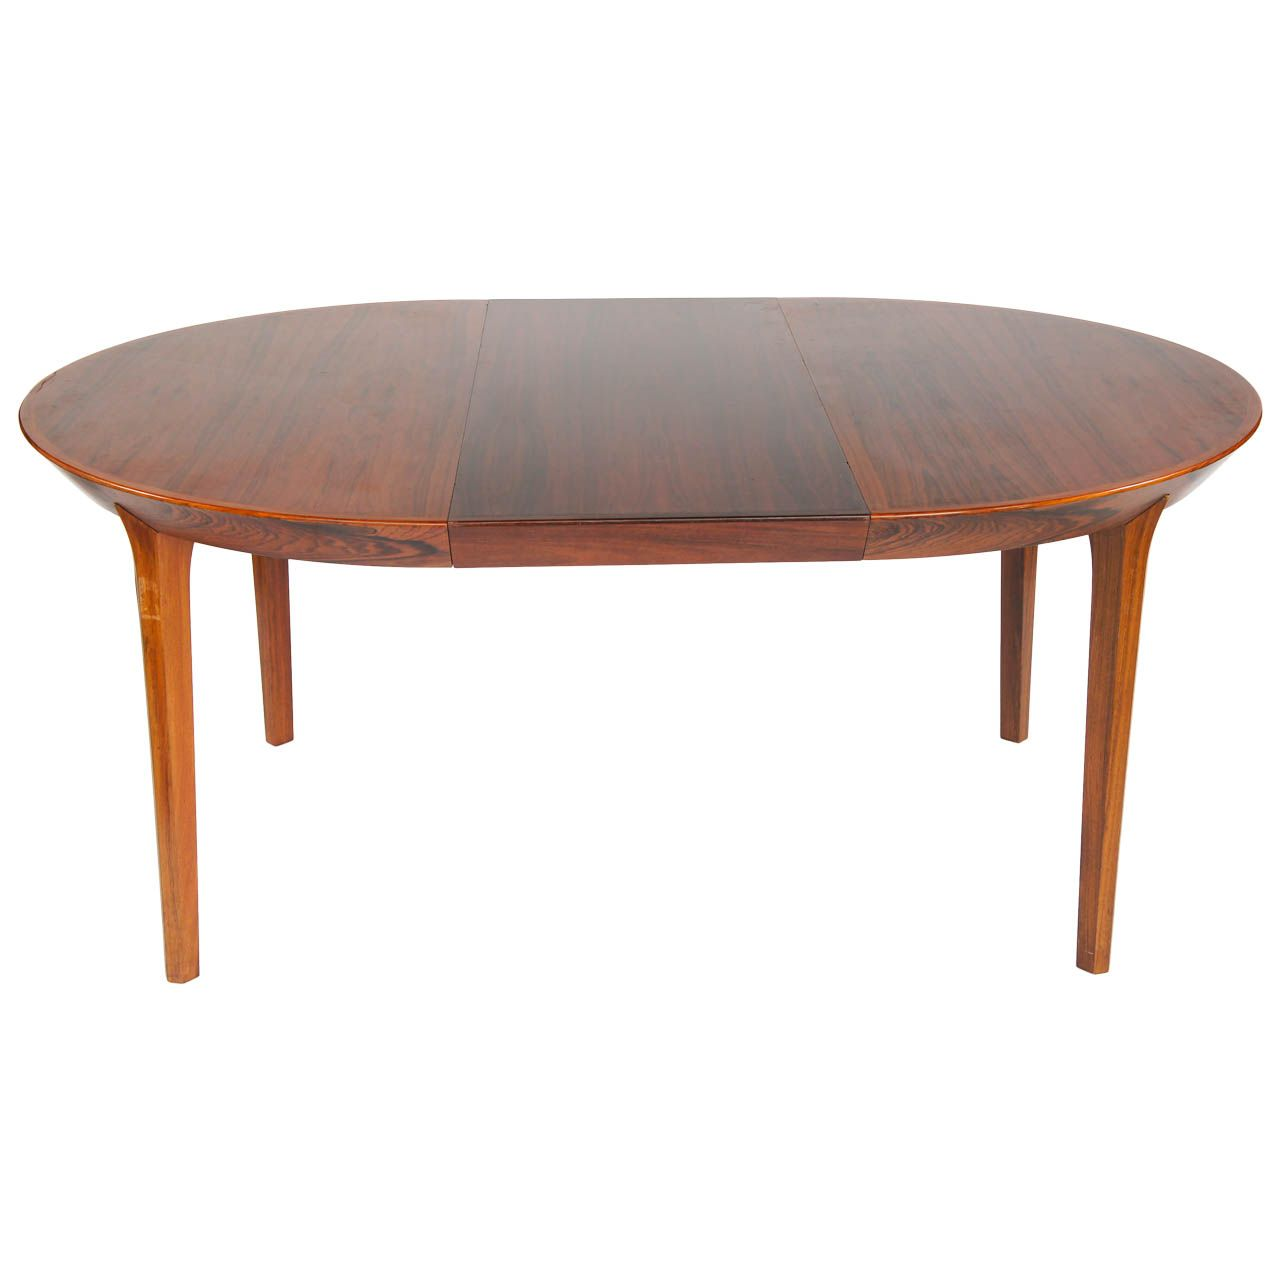 1280x1280 kai kristiansen dining room table dining table